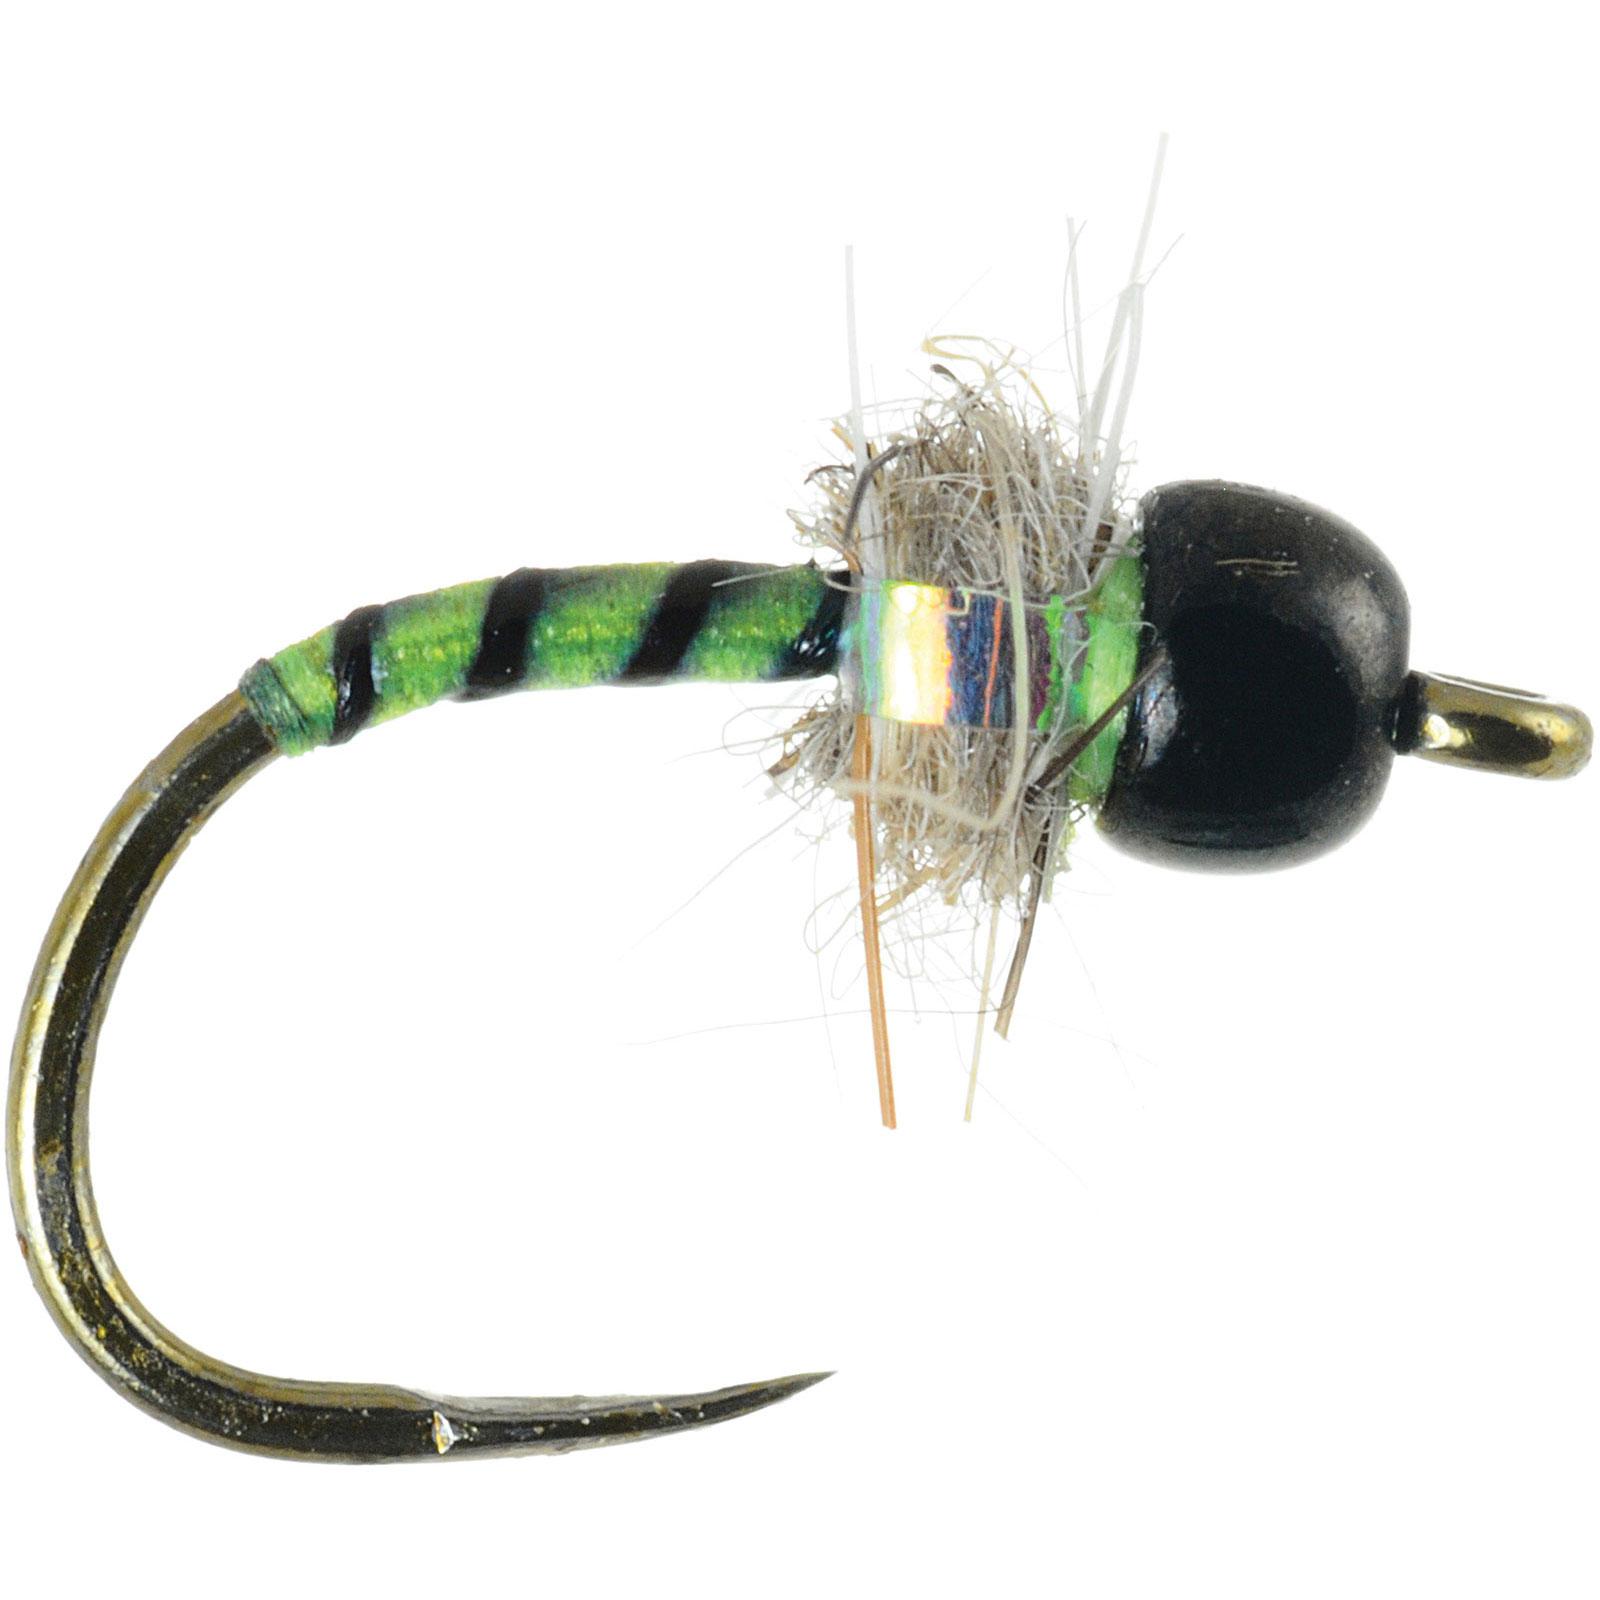 Umpqua icu midge tungsten chartreuse fly fishing midges for Midge fly fishing